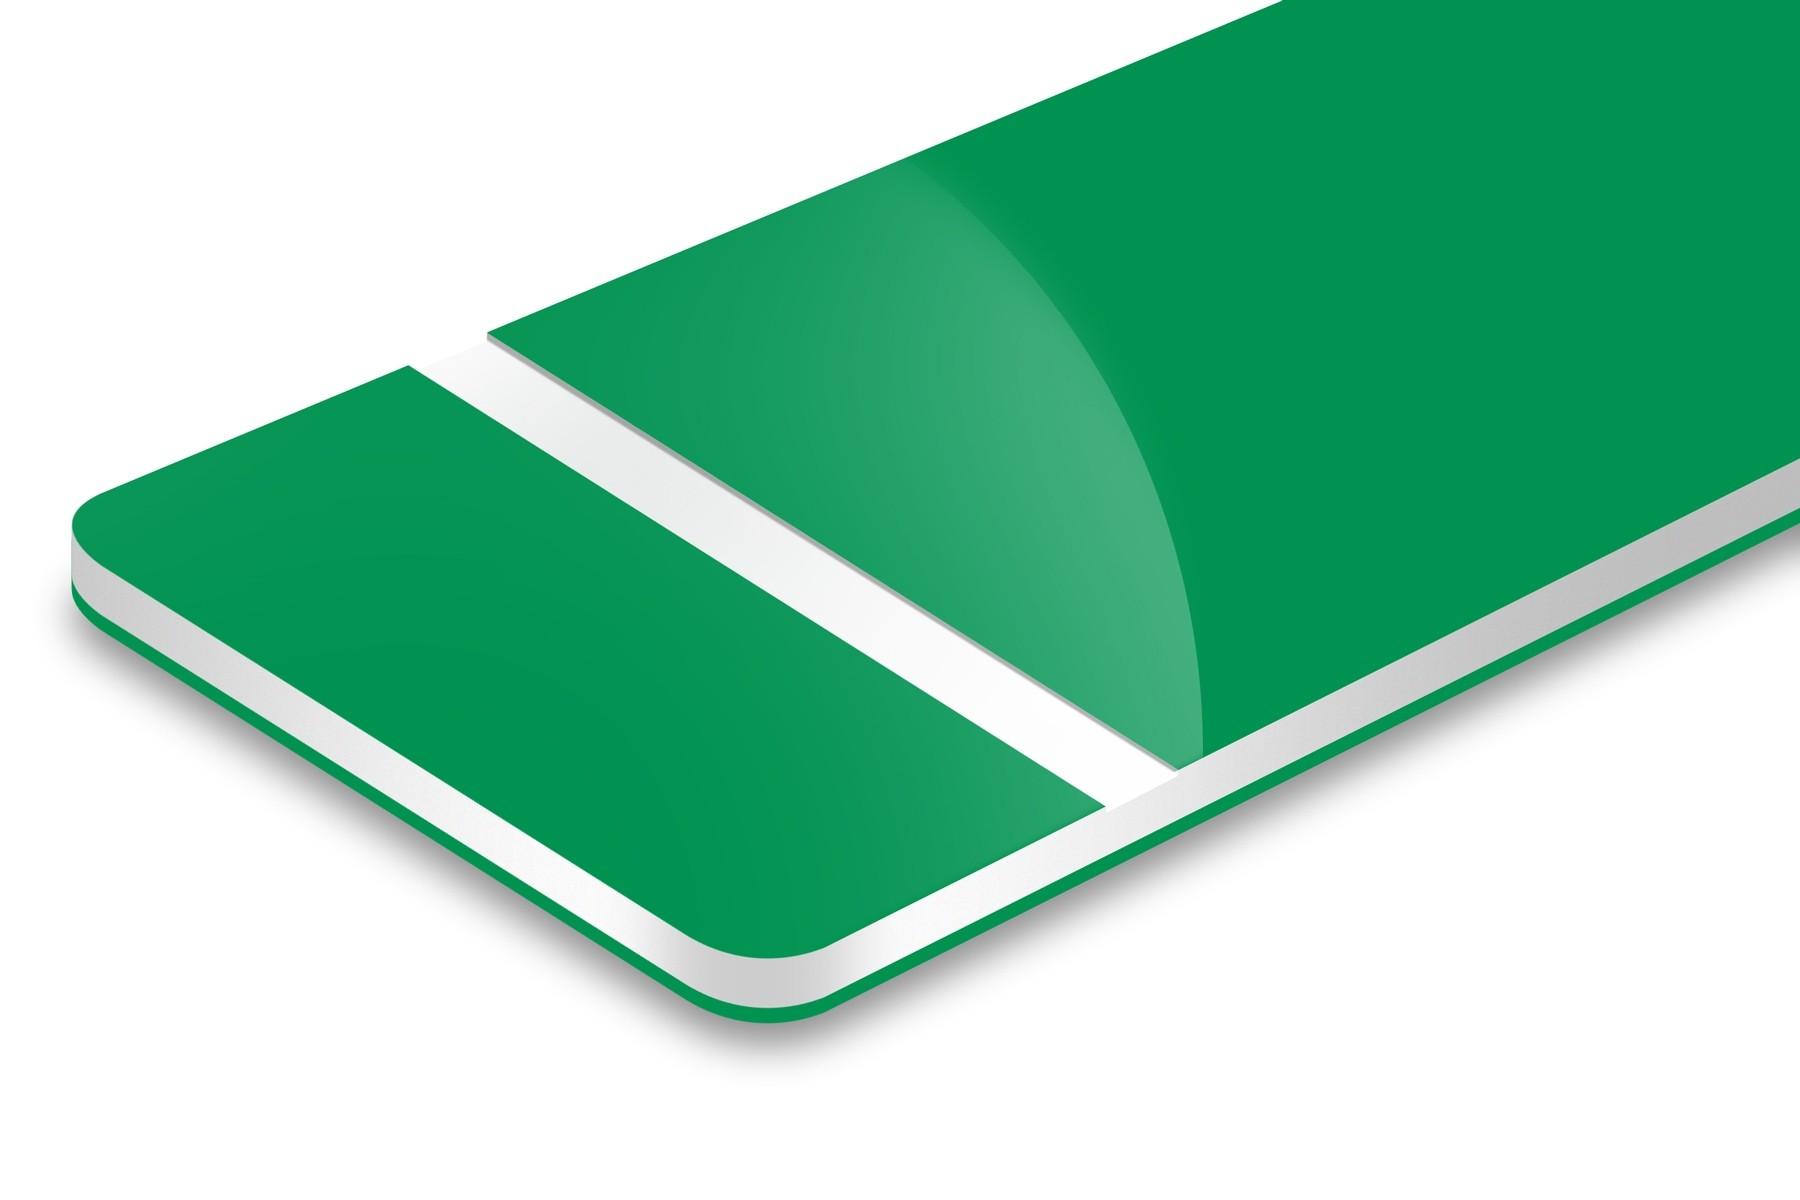 PH932-306 Bri.Green/Whte/Bri.Green 1,6mm